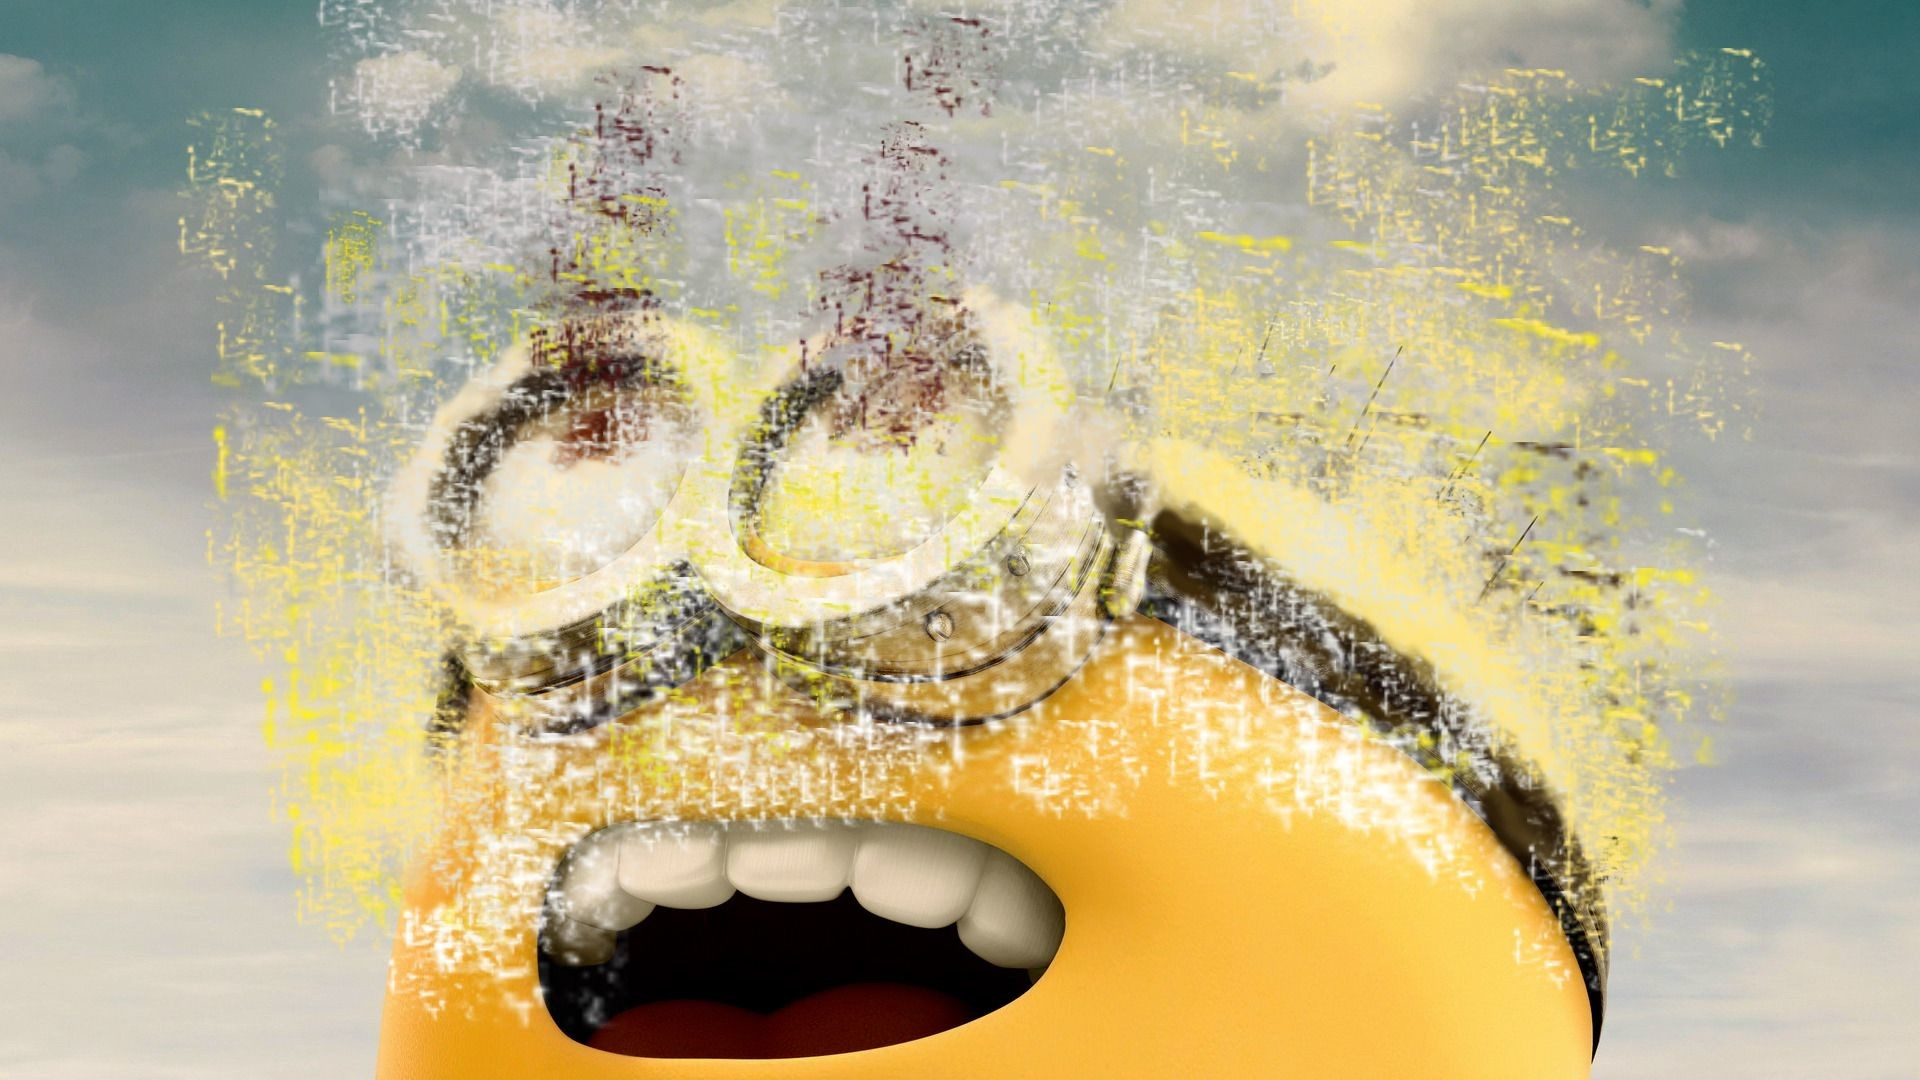 Minions Full HD Desktop Wallpaper 2469 Hd Wallpapers